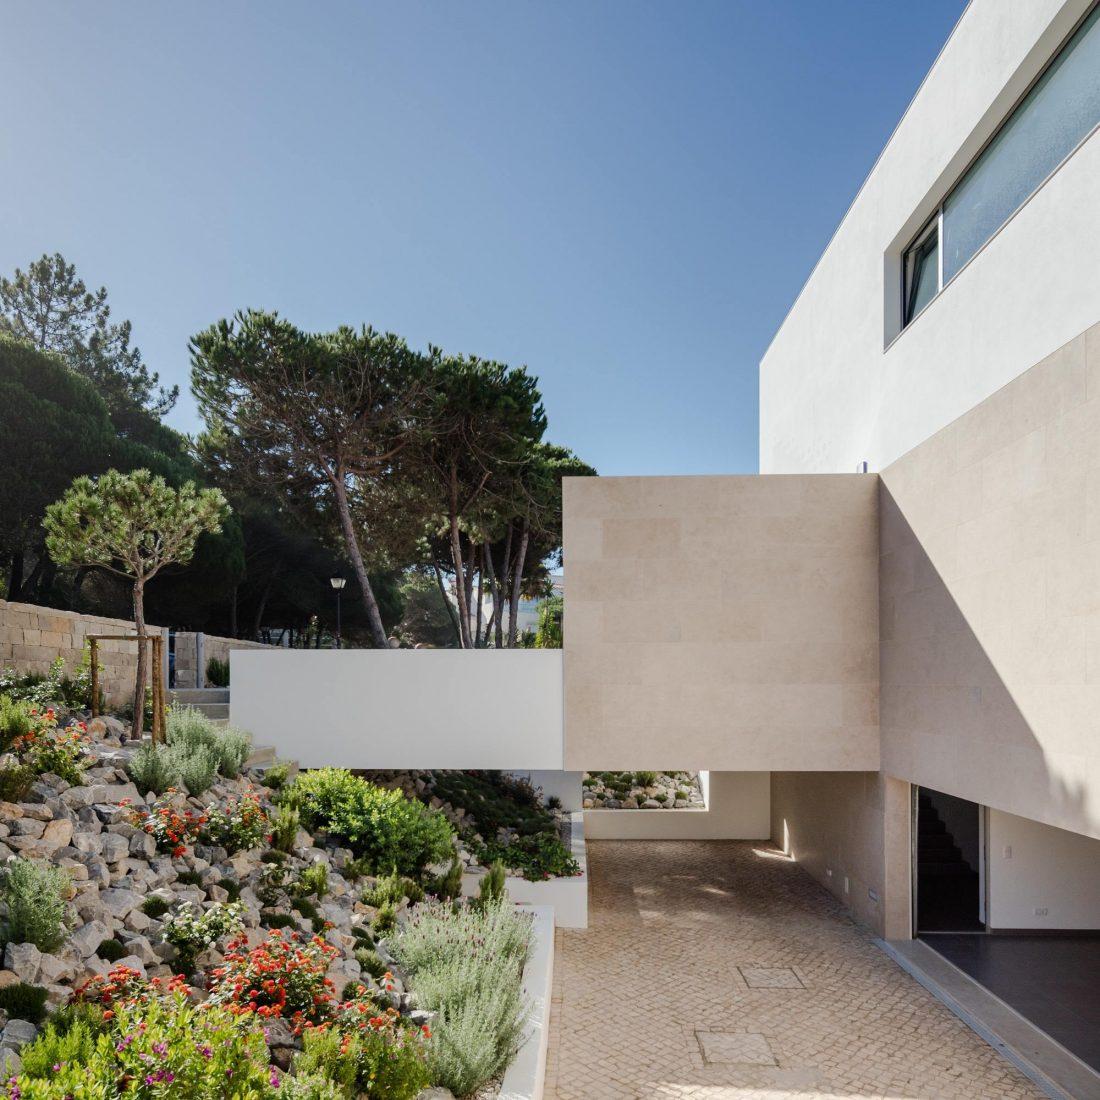 Дом в Обидуше, Португалия, от студии RSM arquitecto и Russell Jones Architects 1